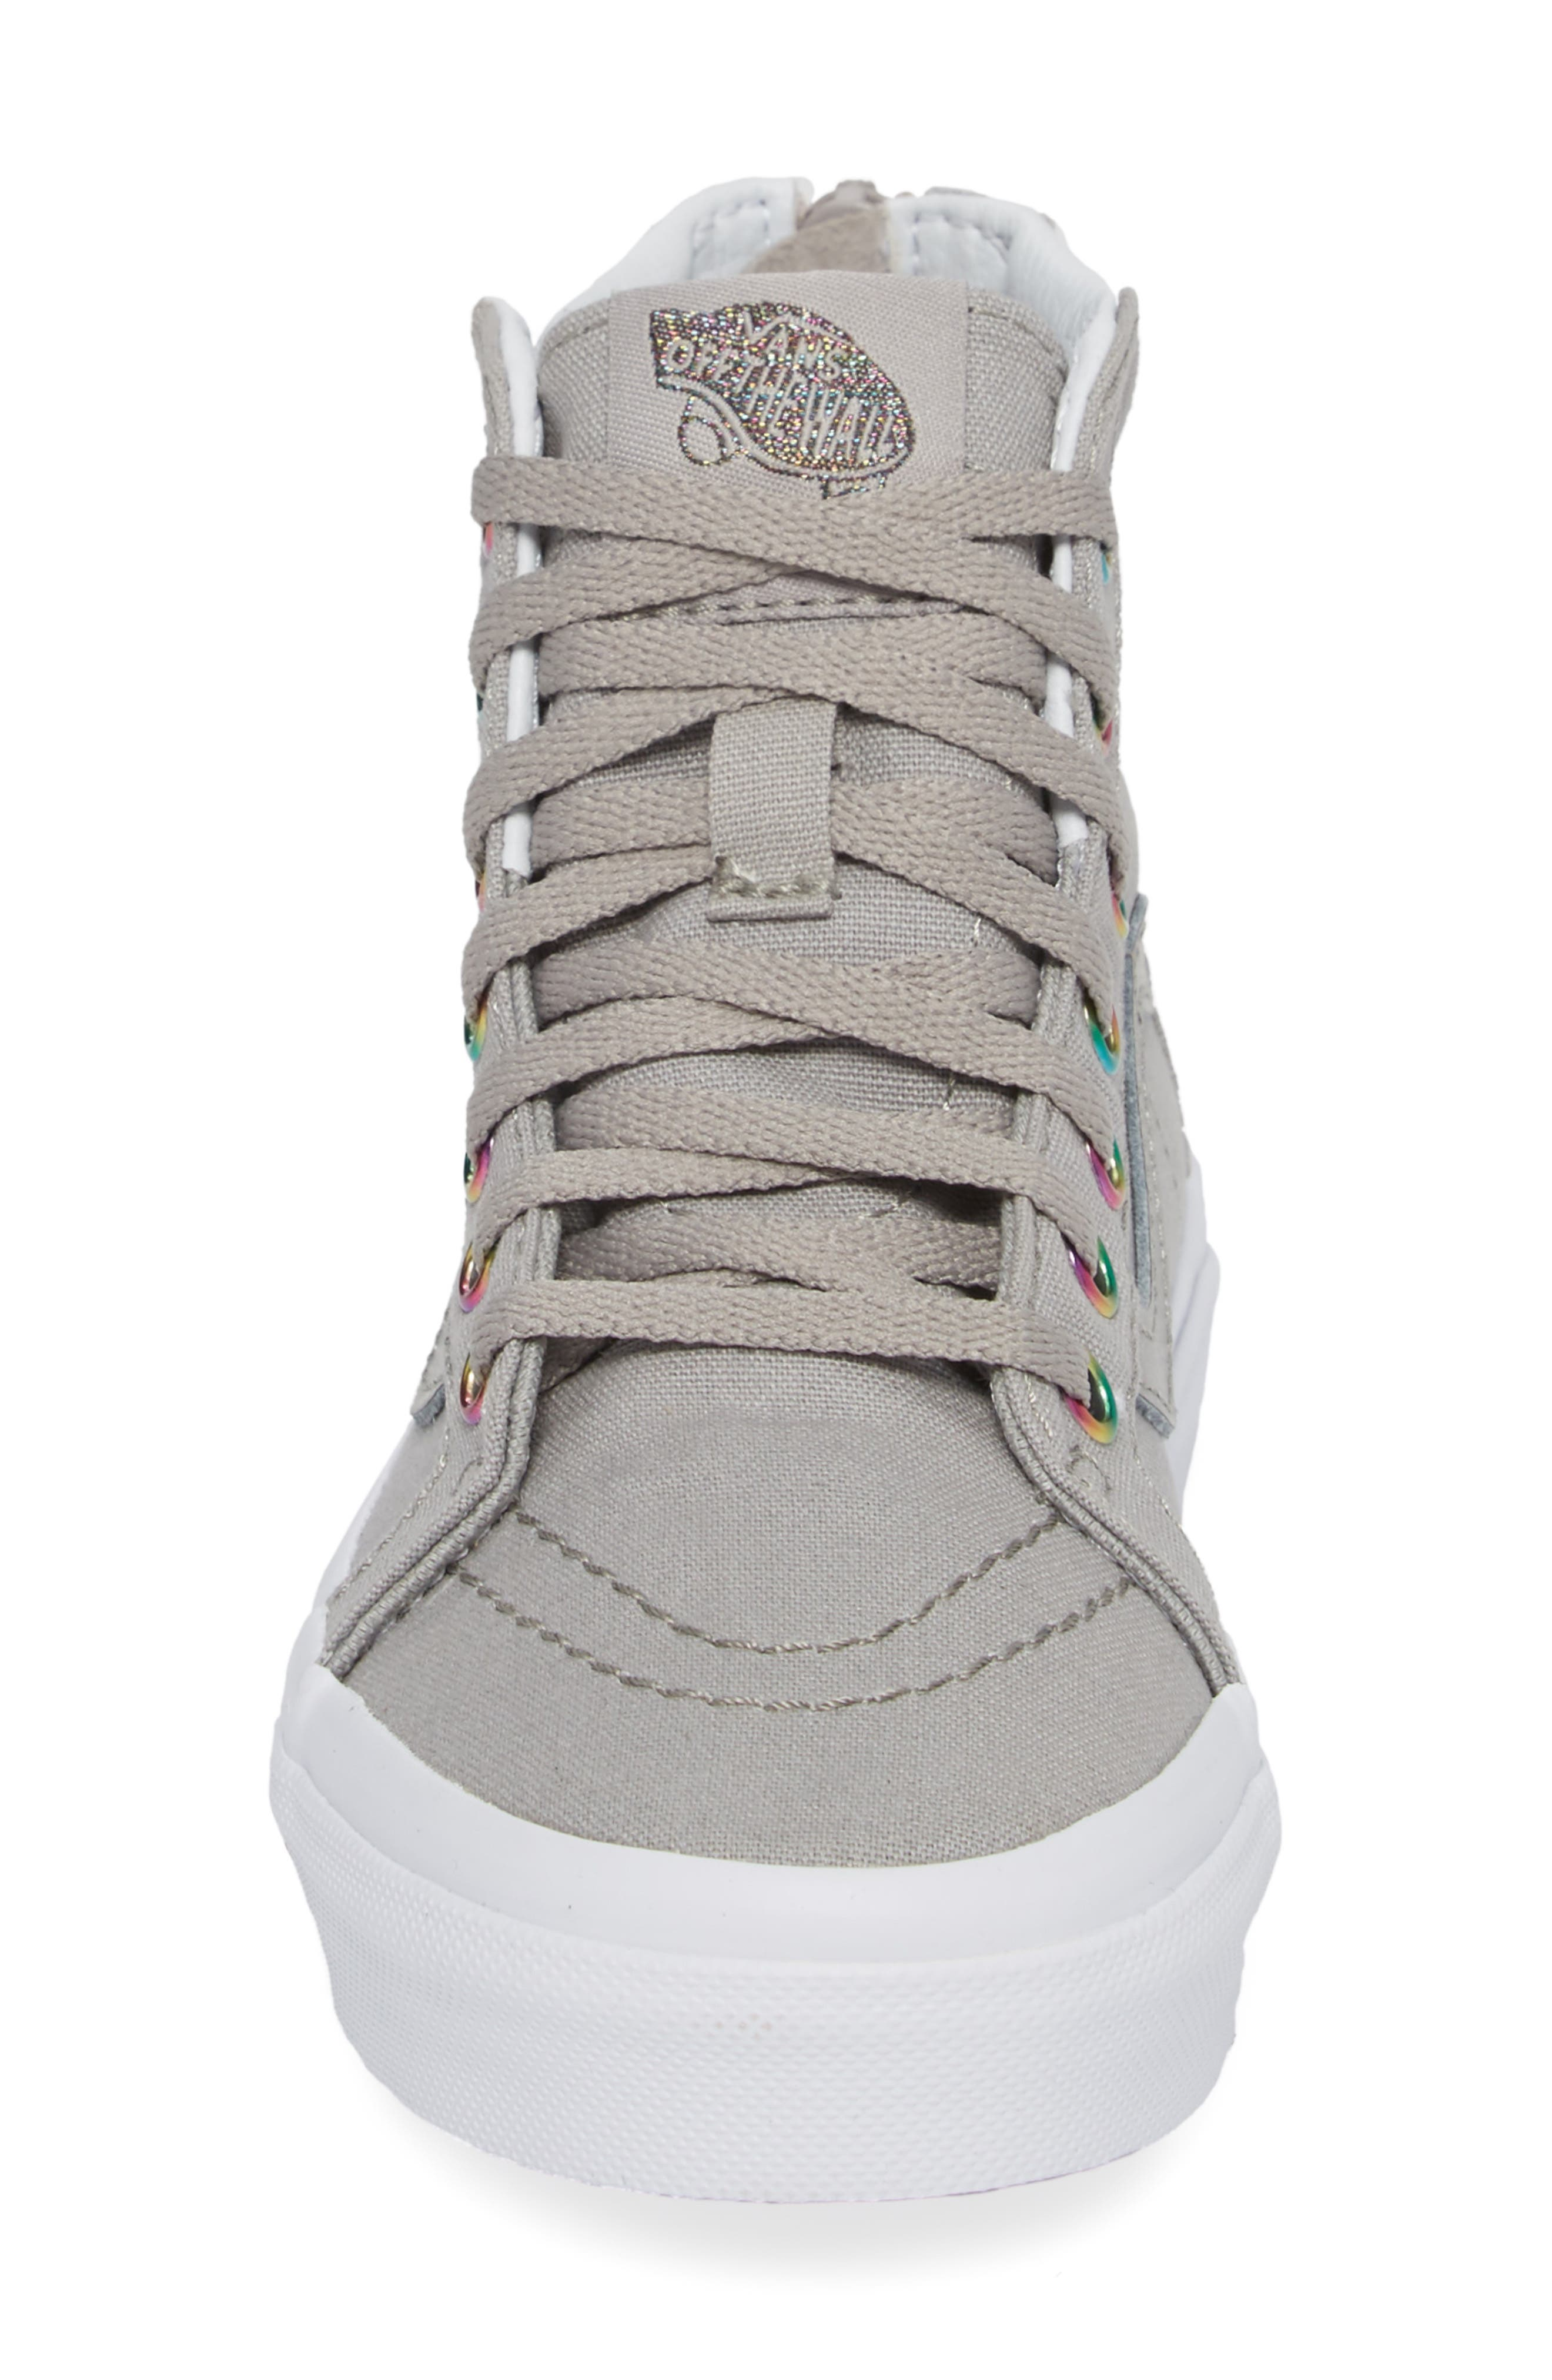 Sk8-Hi Zip High Top Sneaker,                             Alternate thumbnail 4, color,                             Rainbow Eyelet Drizzle